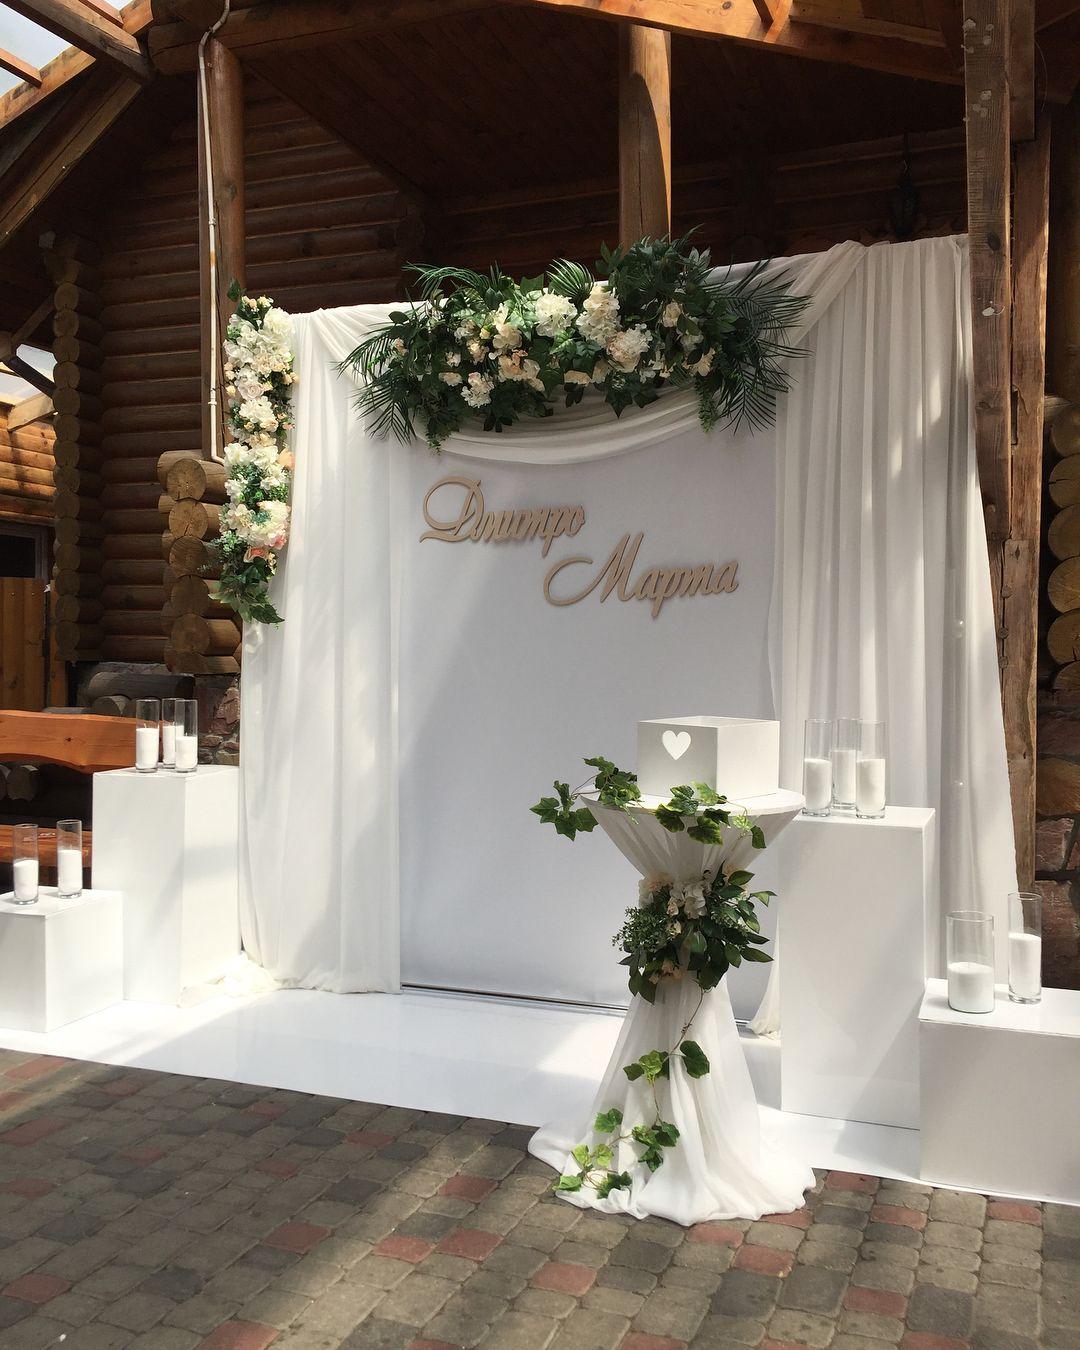 Wedding Venue Decoration Ideas: Pin By Tara Haviland On Party Ideas